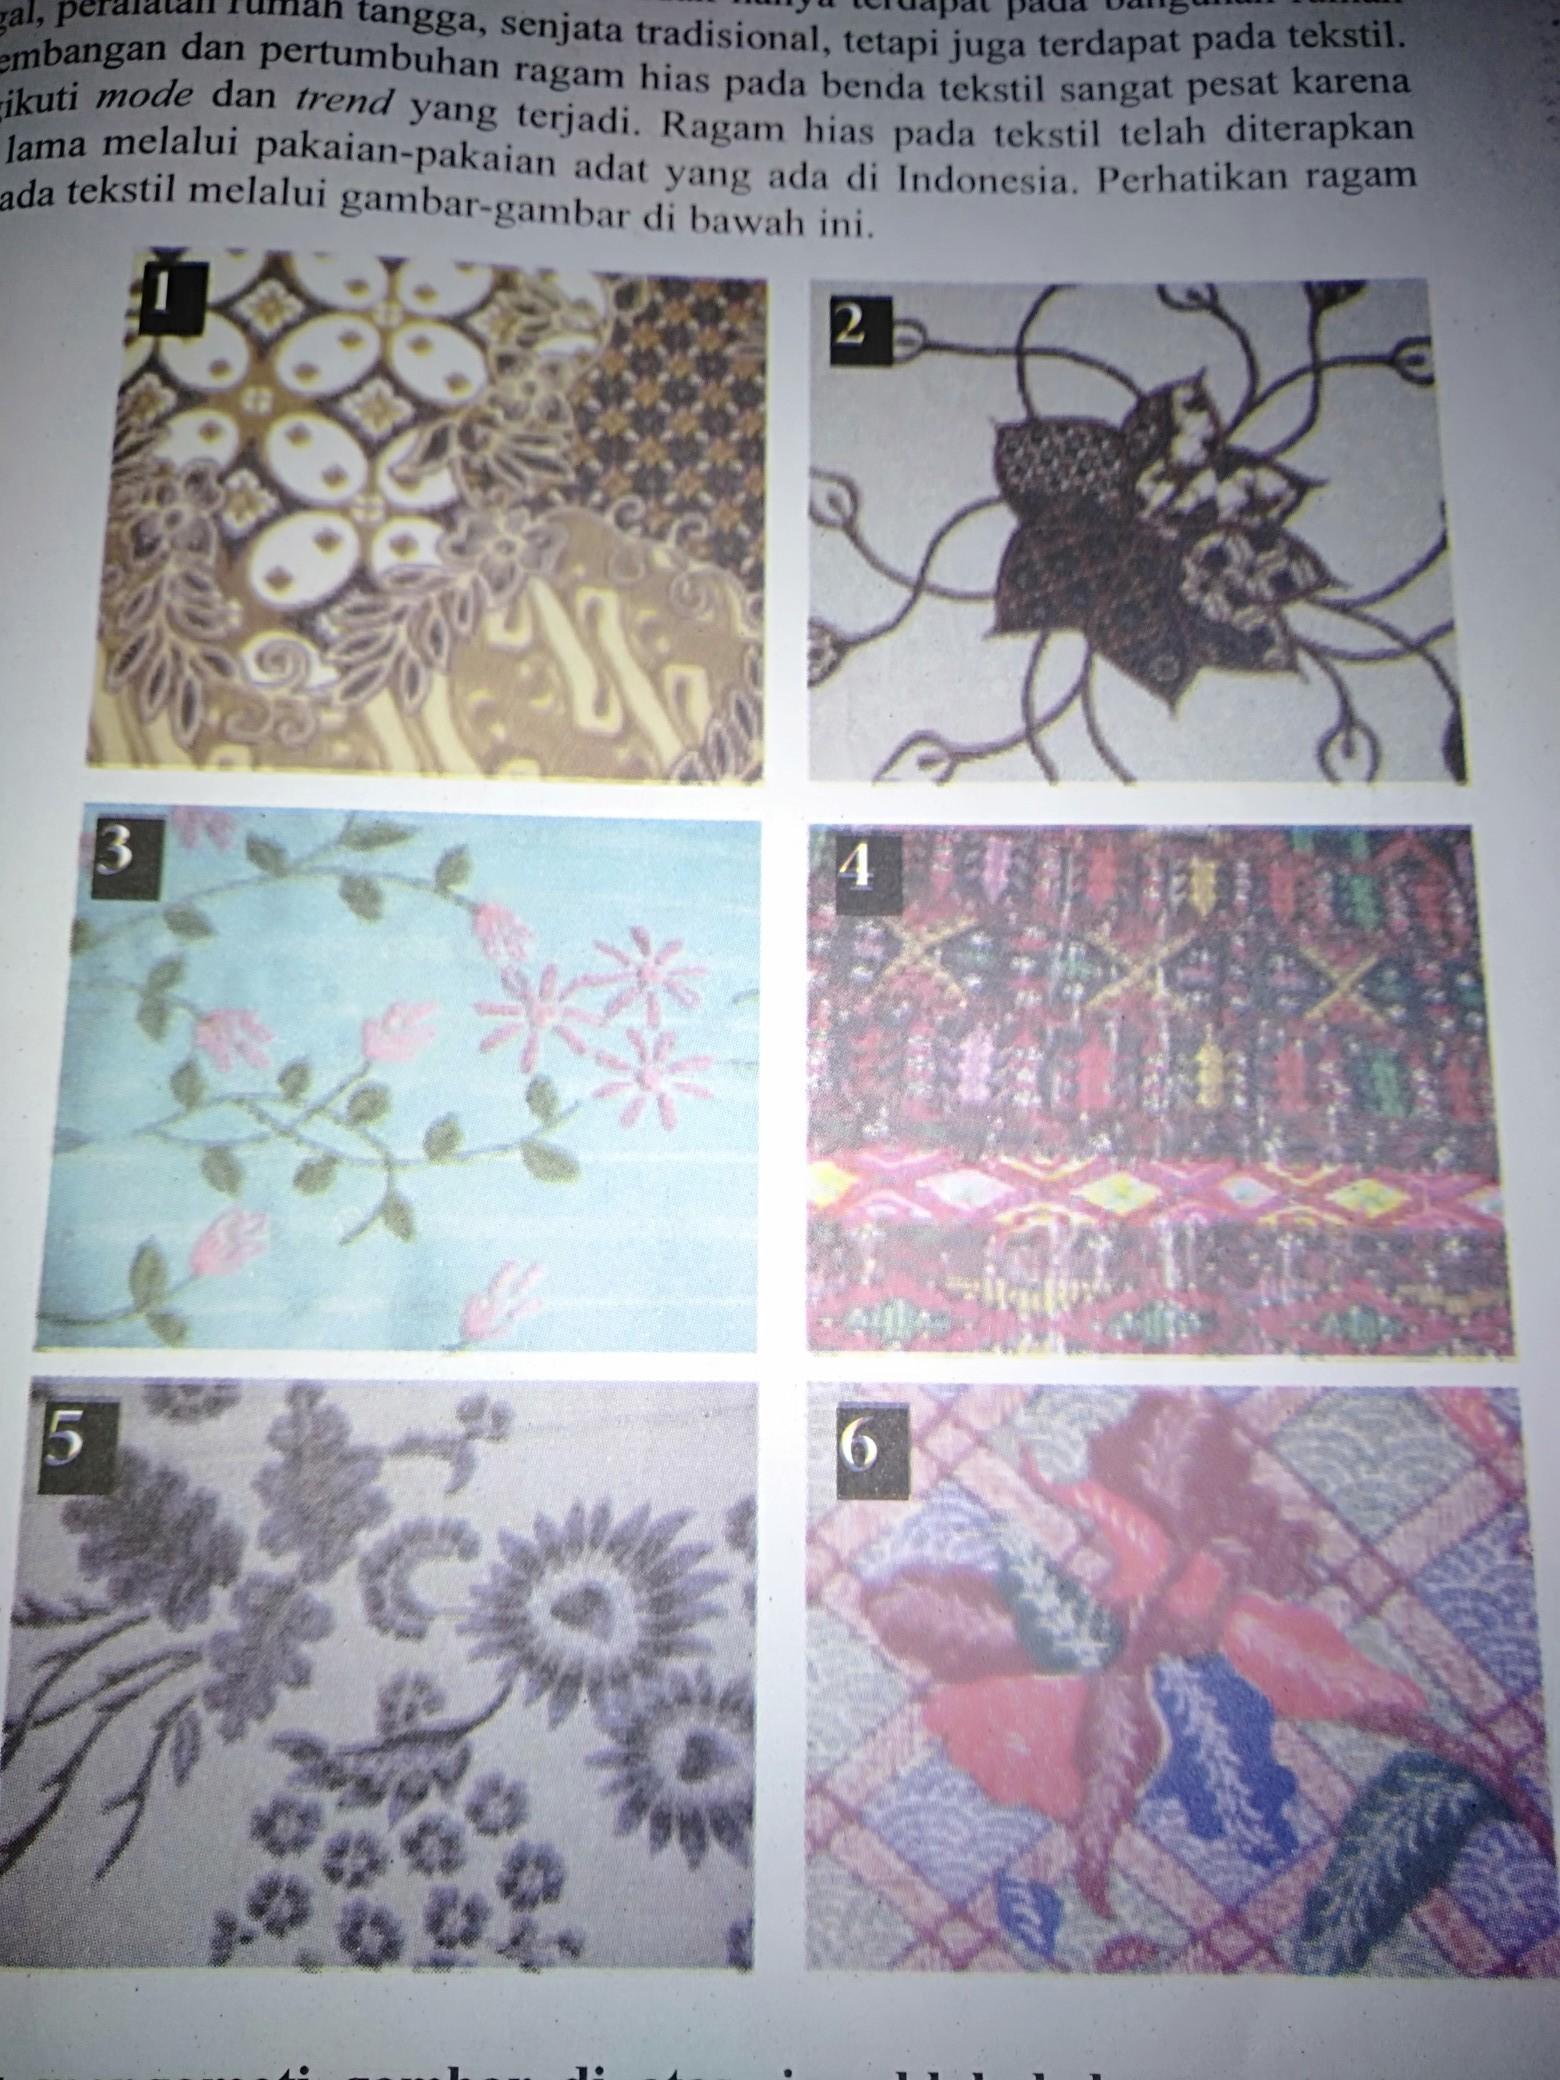 Teknik Menggambar Ragam Hias Pada Bahan Tekstil : teknik, menggambar, ragam, bahan, tekstil, Jenis, Ragam, Bahan, Tekstil